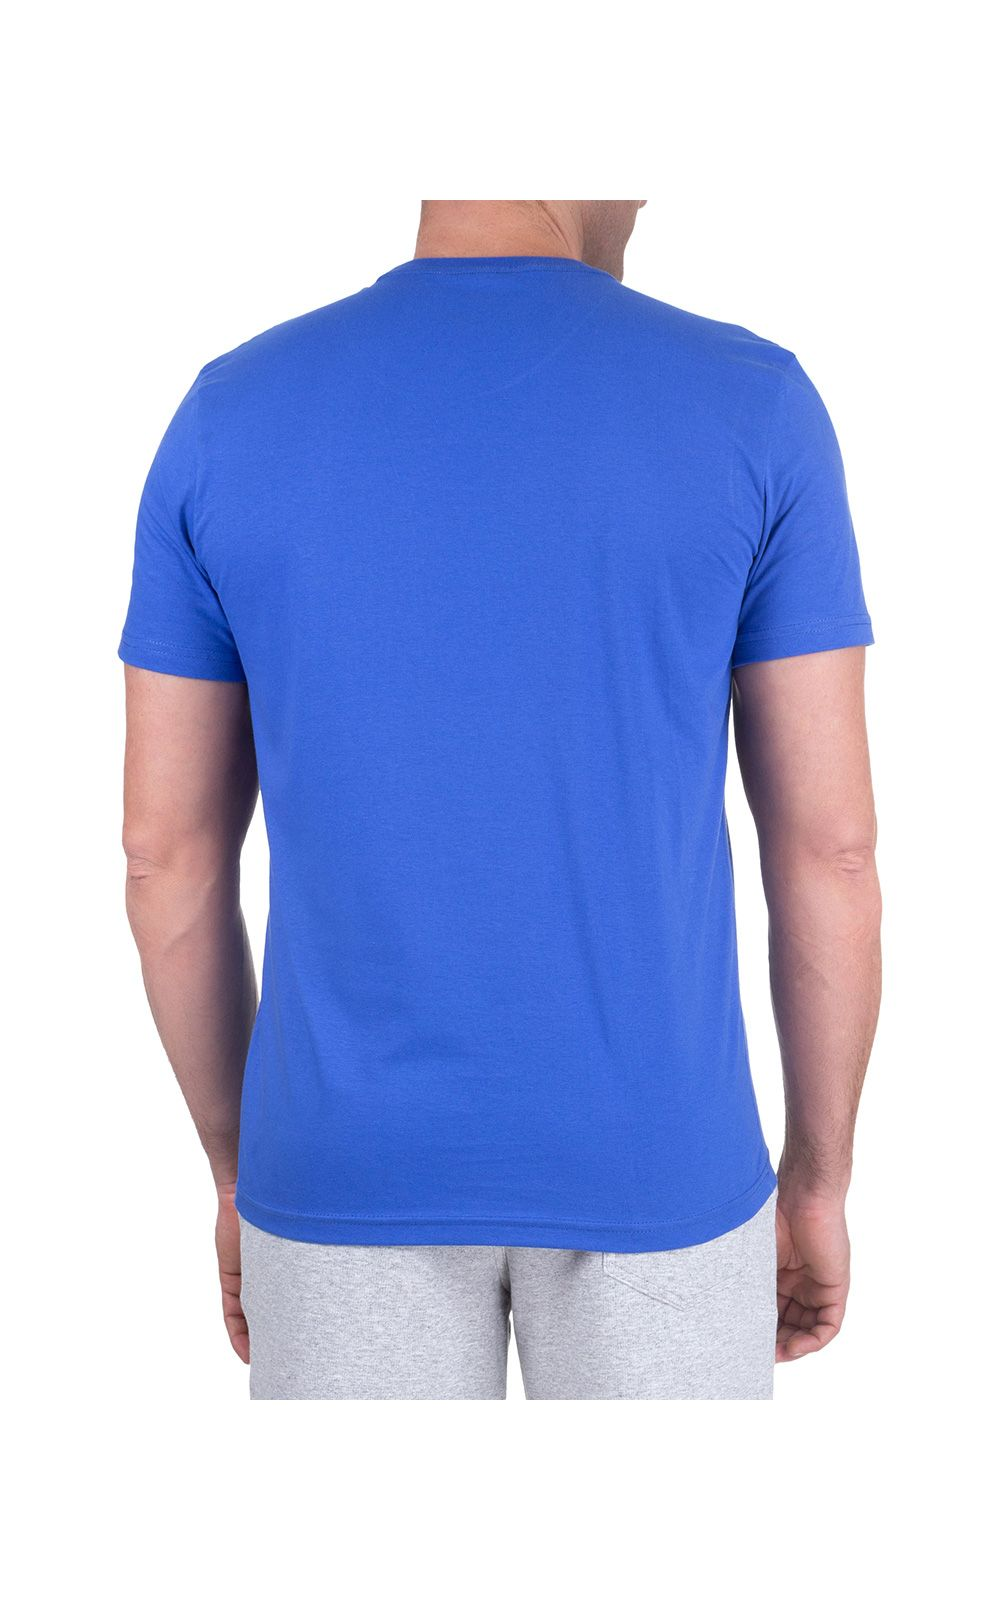 Foto 2 - Camiseta Masculina Azul Lisa